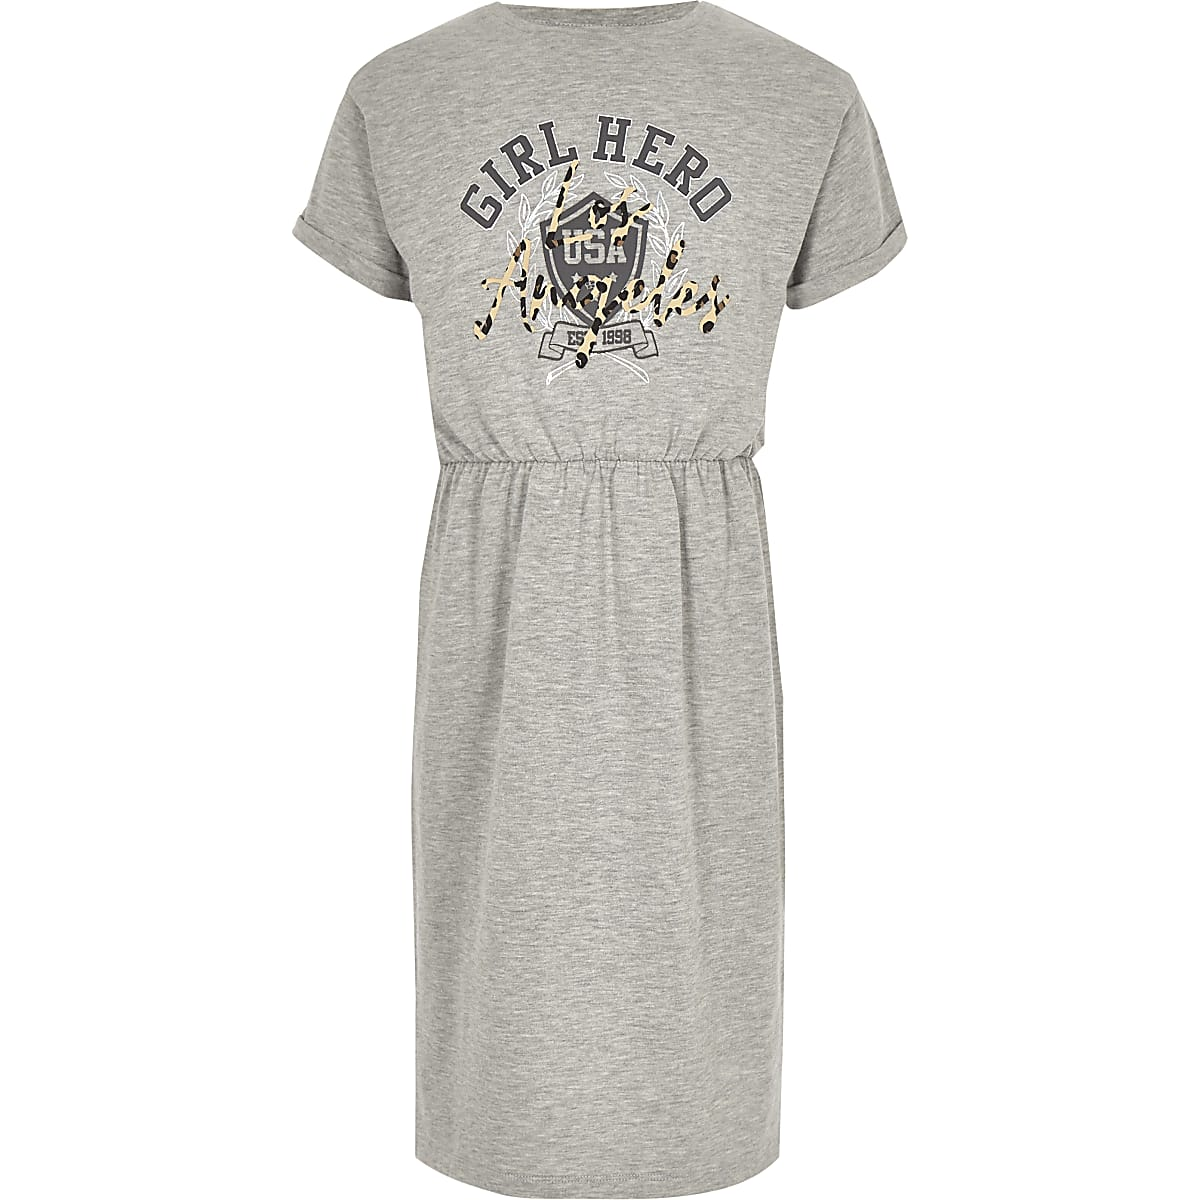 Girls grey 'Girl hero' T-shirt midi dress